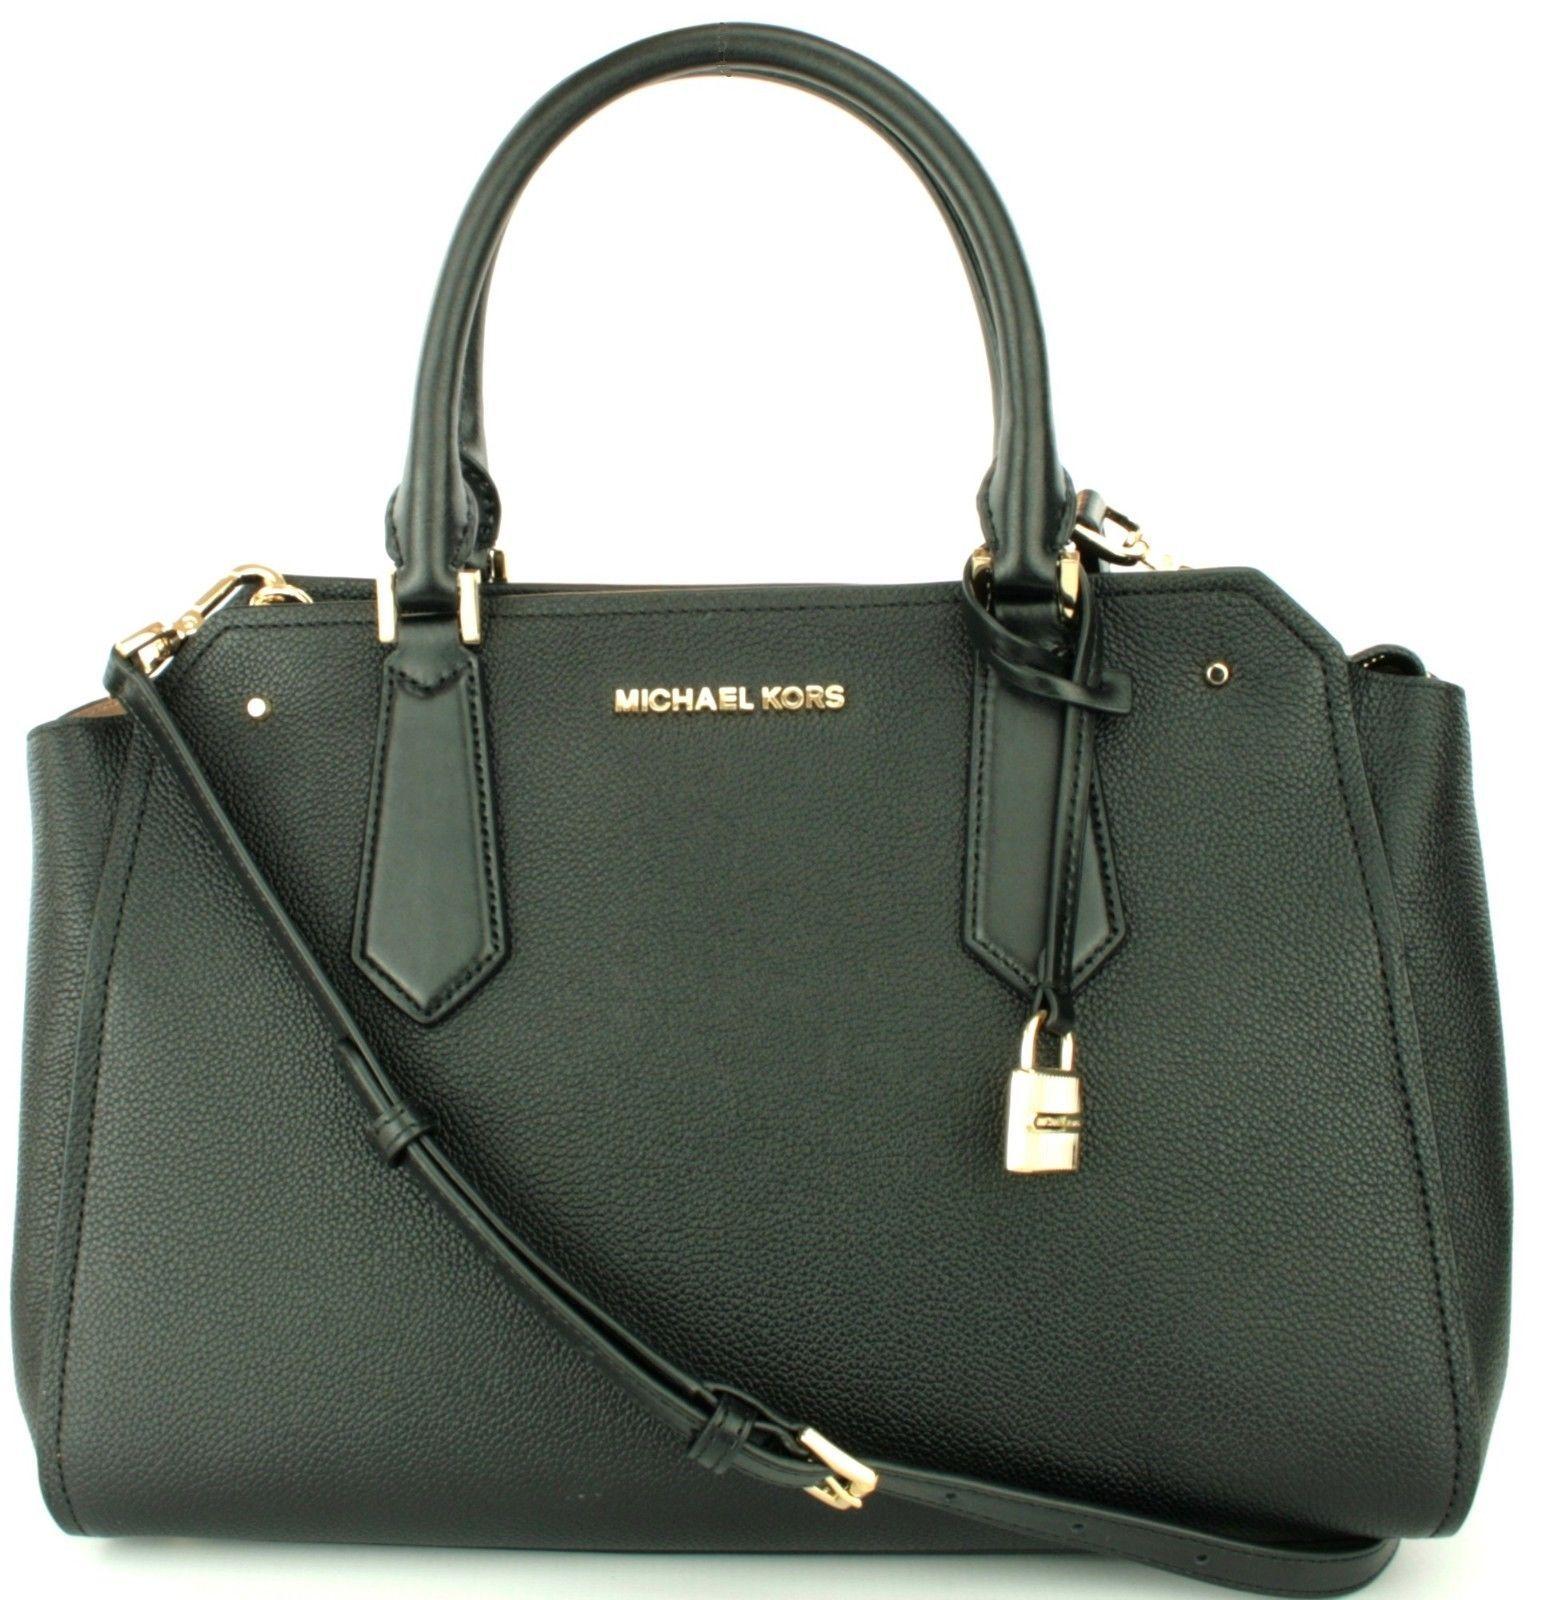 e78e92e5a Michael Kors Hayes Black Leather Shoulder and similar items. 57